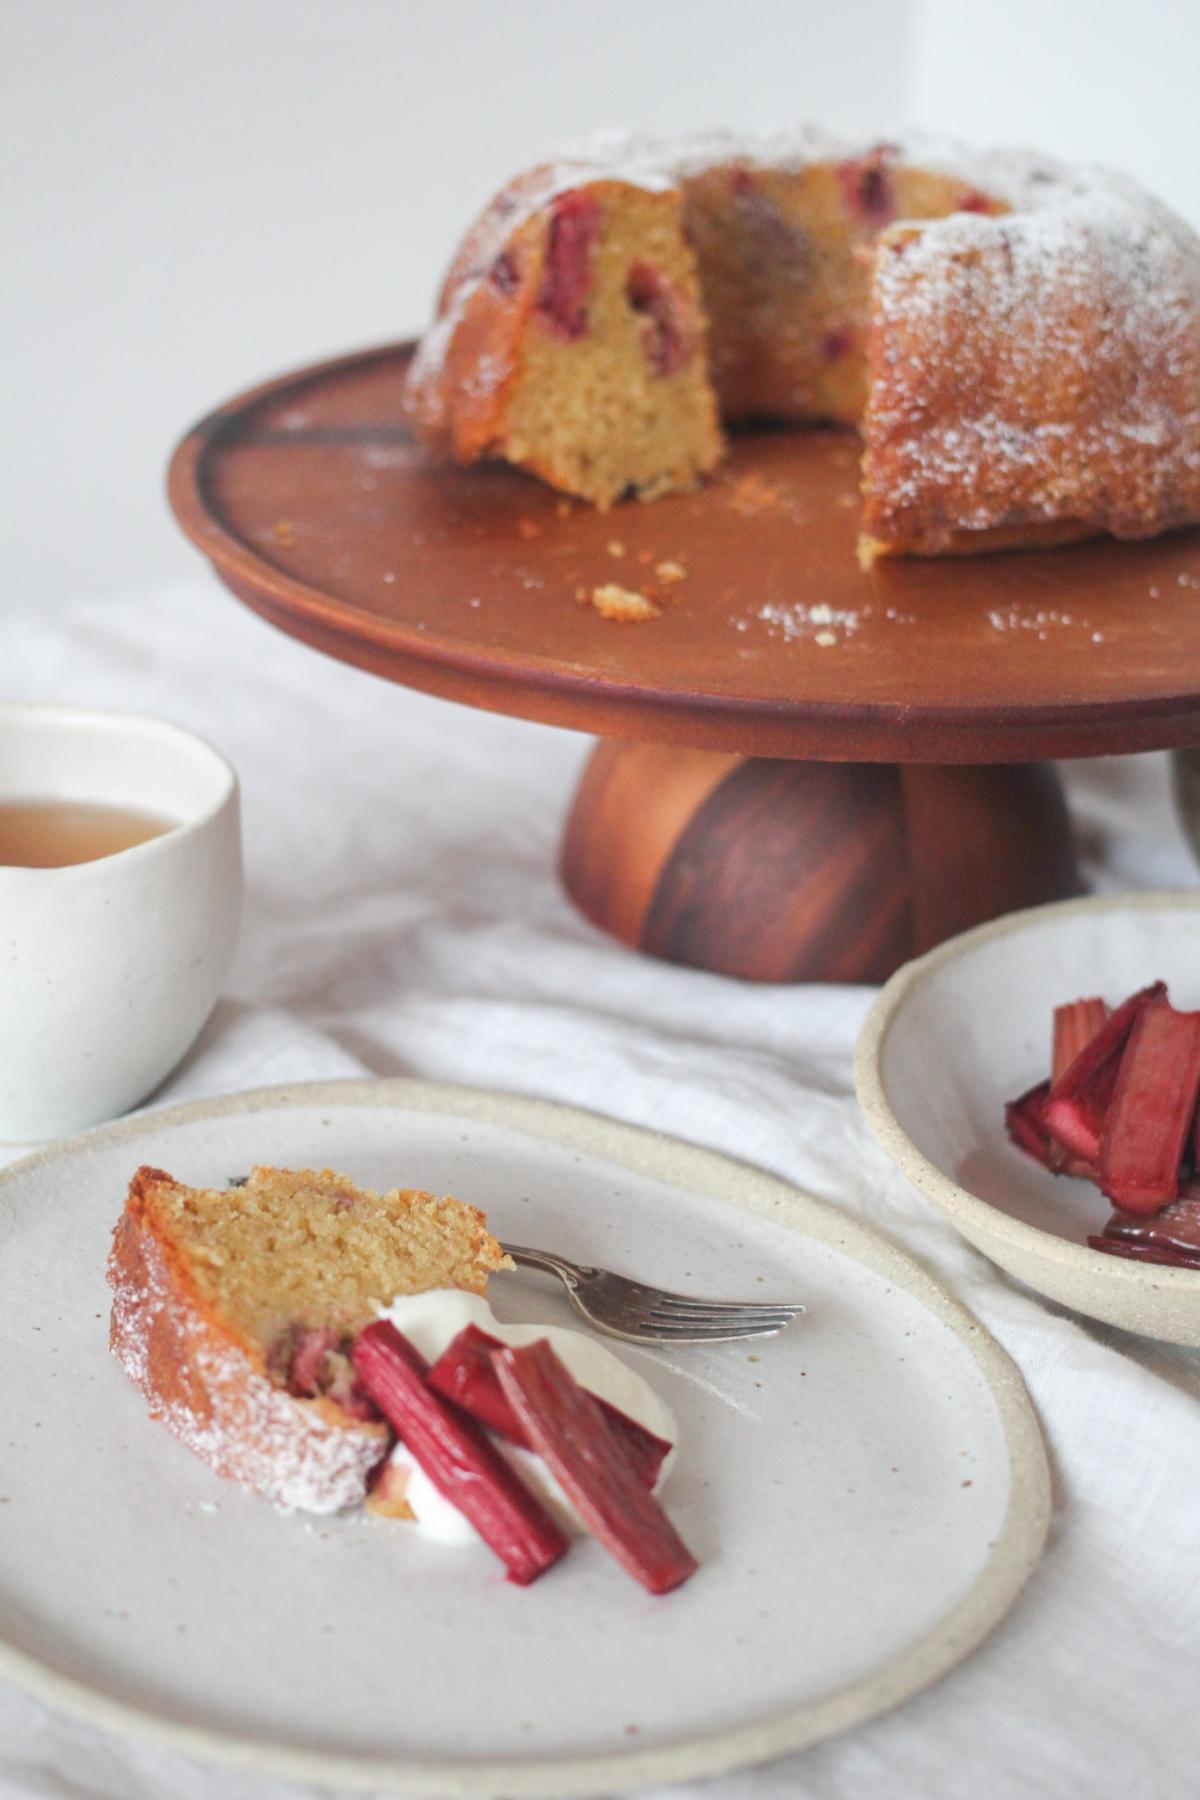 Rhubarb Pound Cake